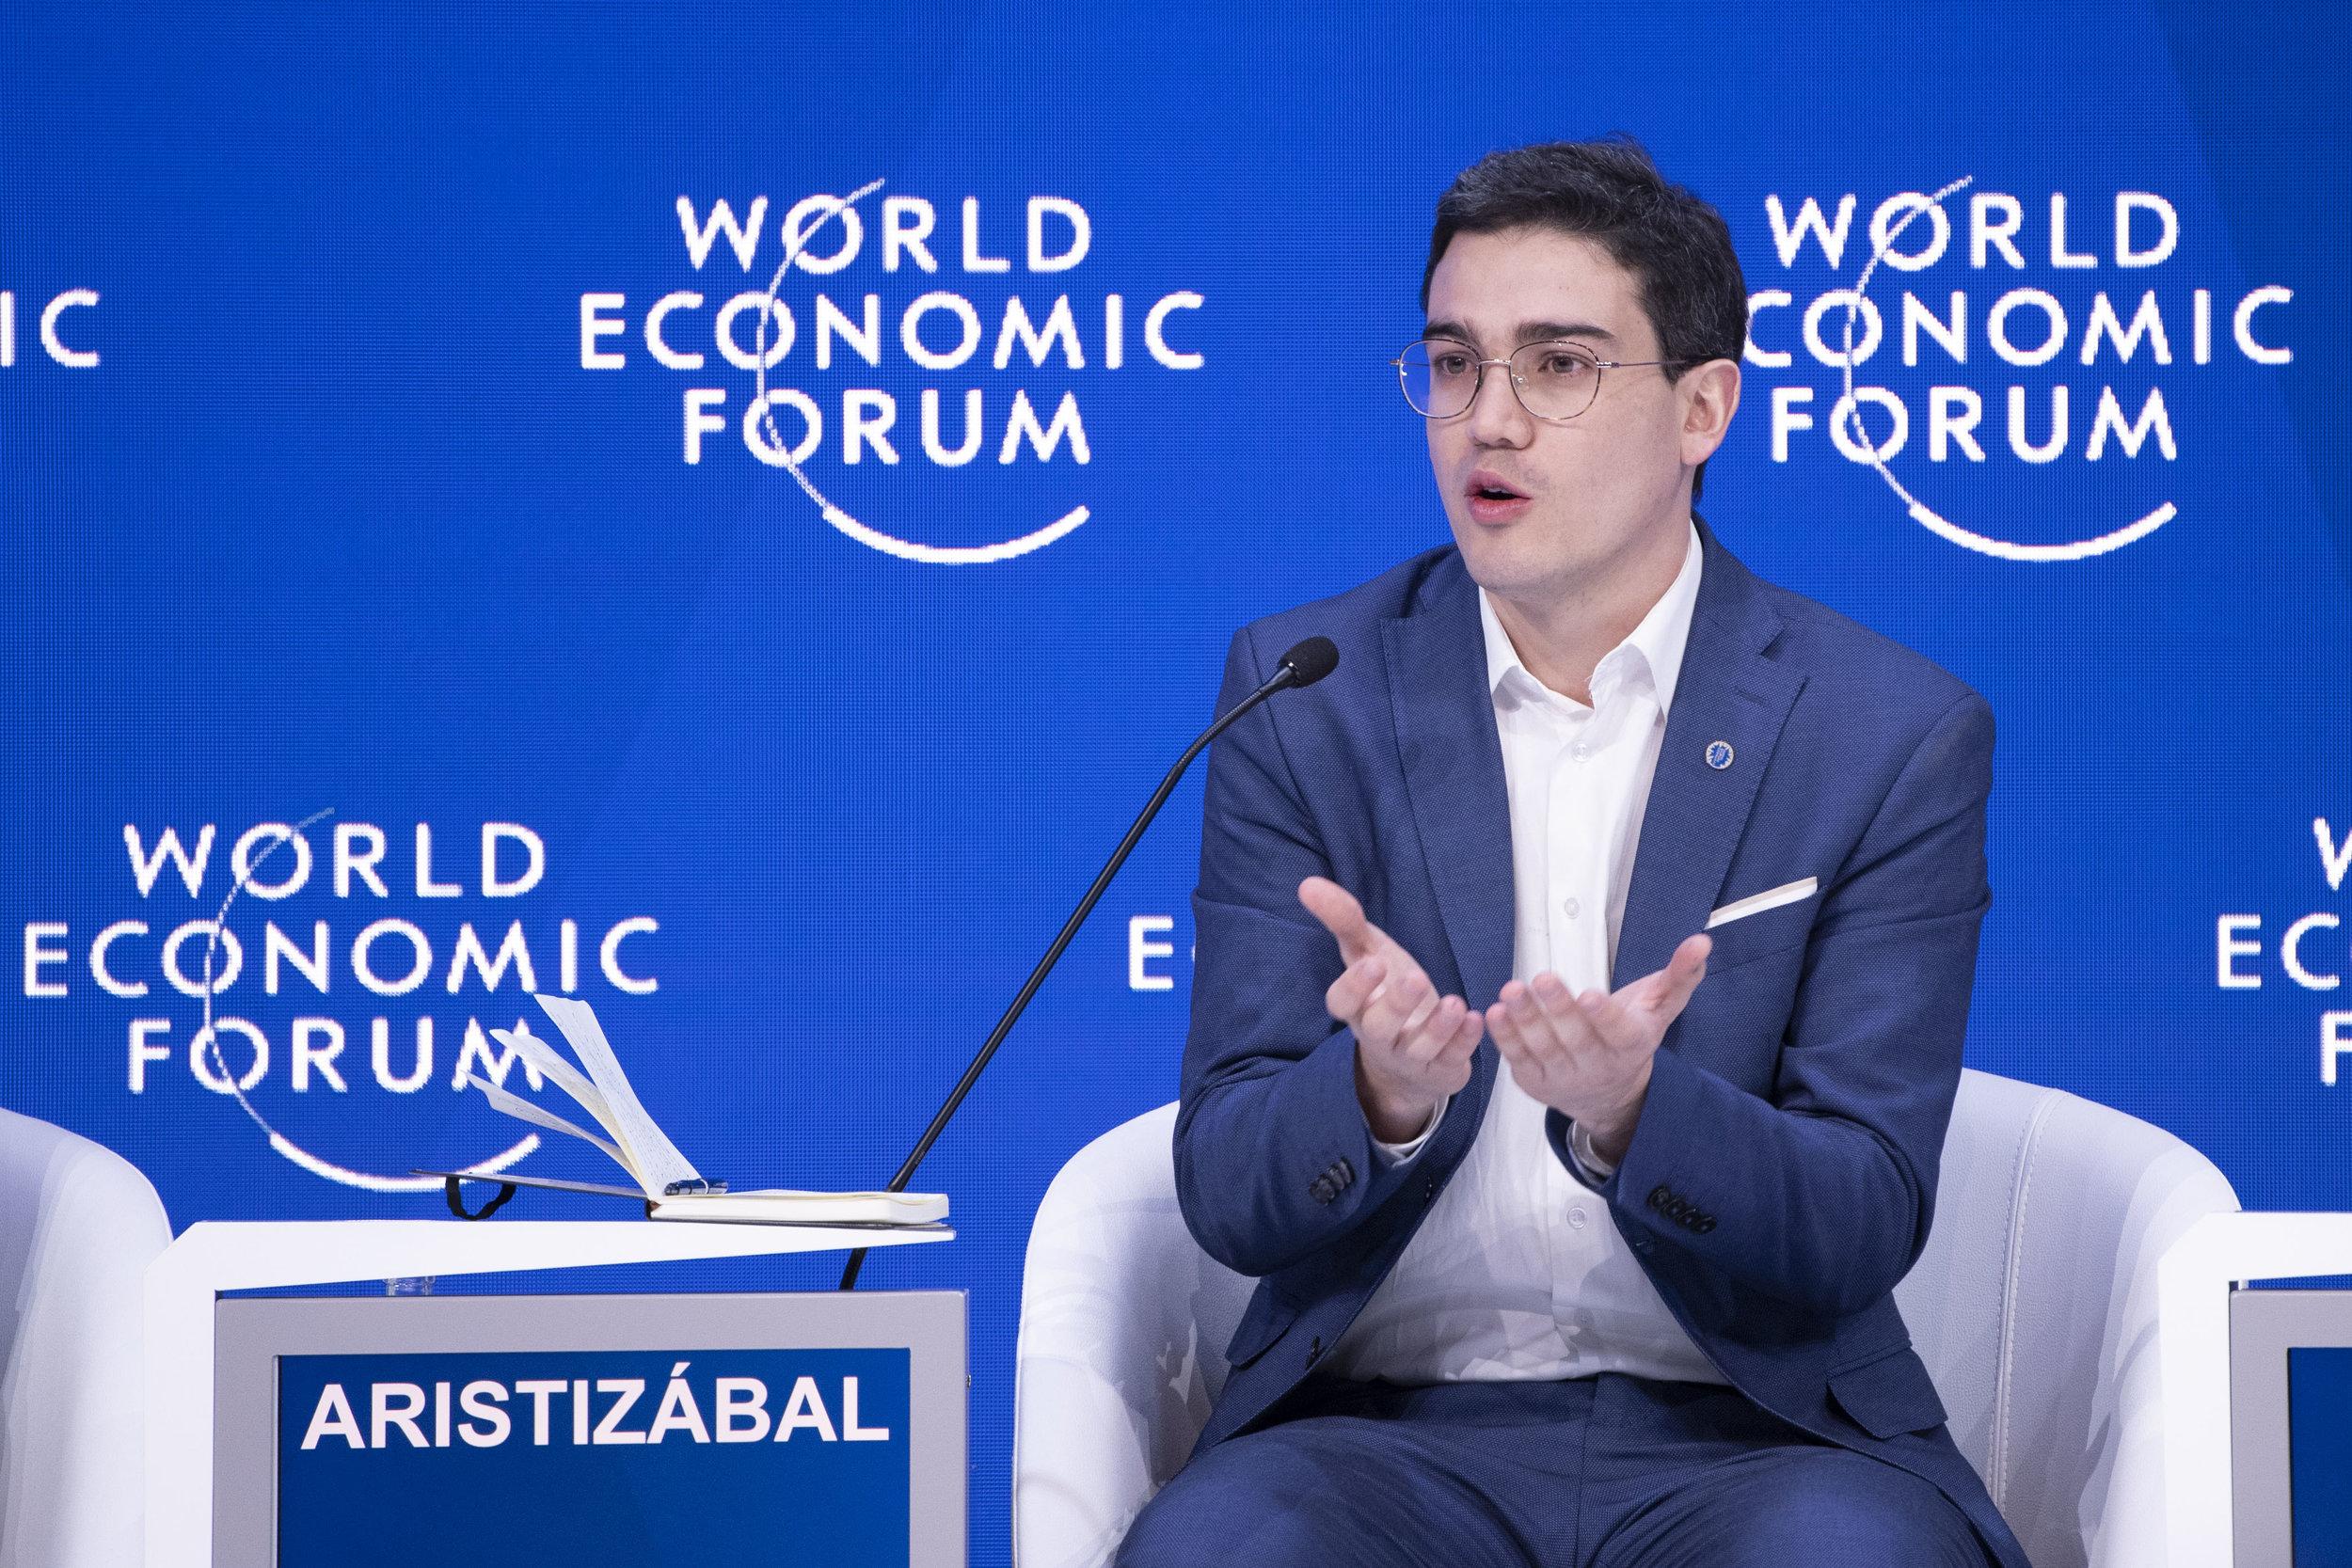 Foto: WEF